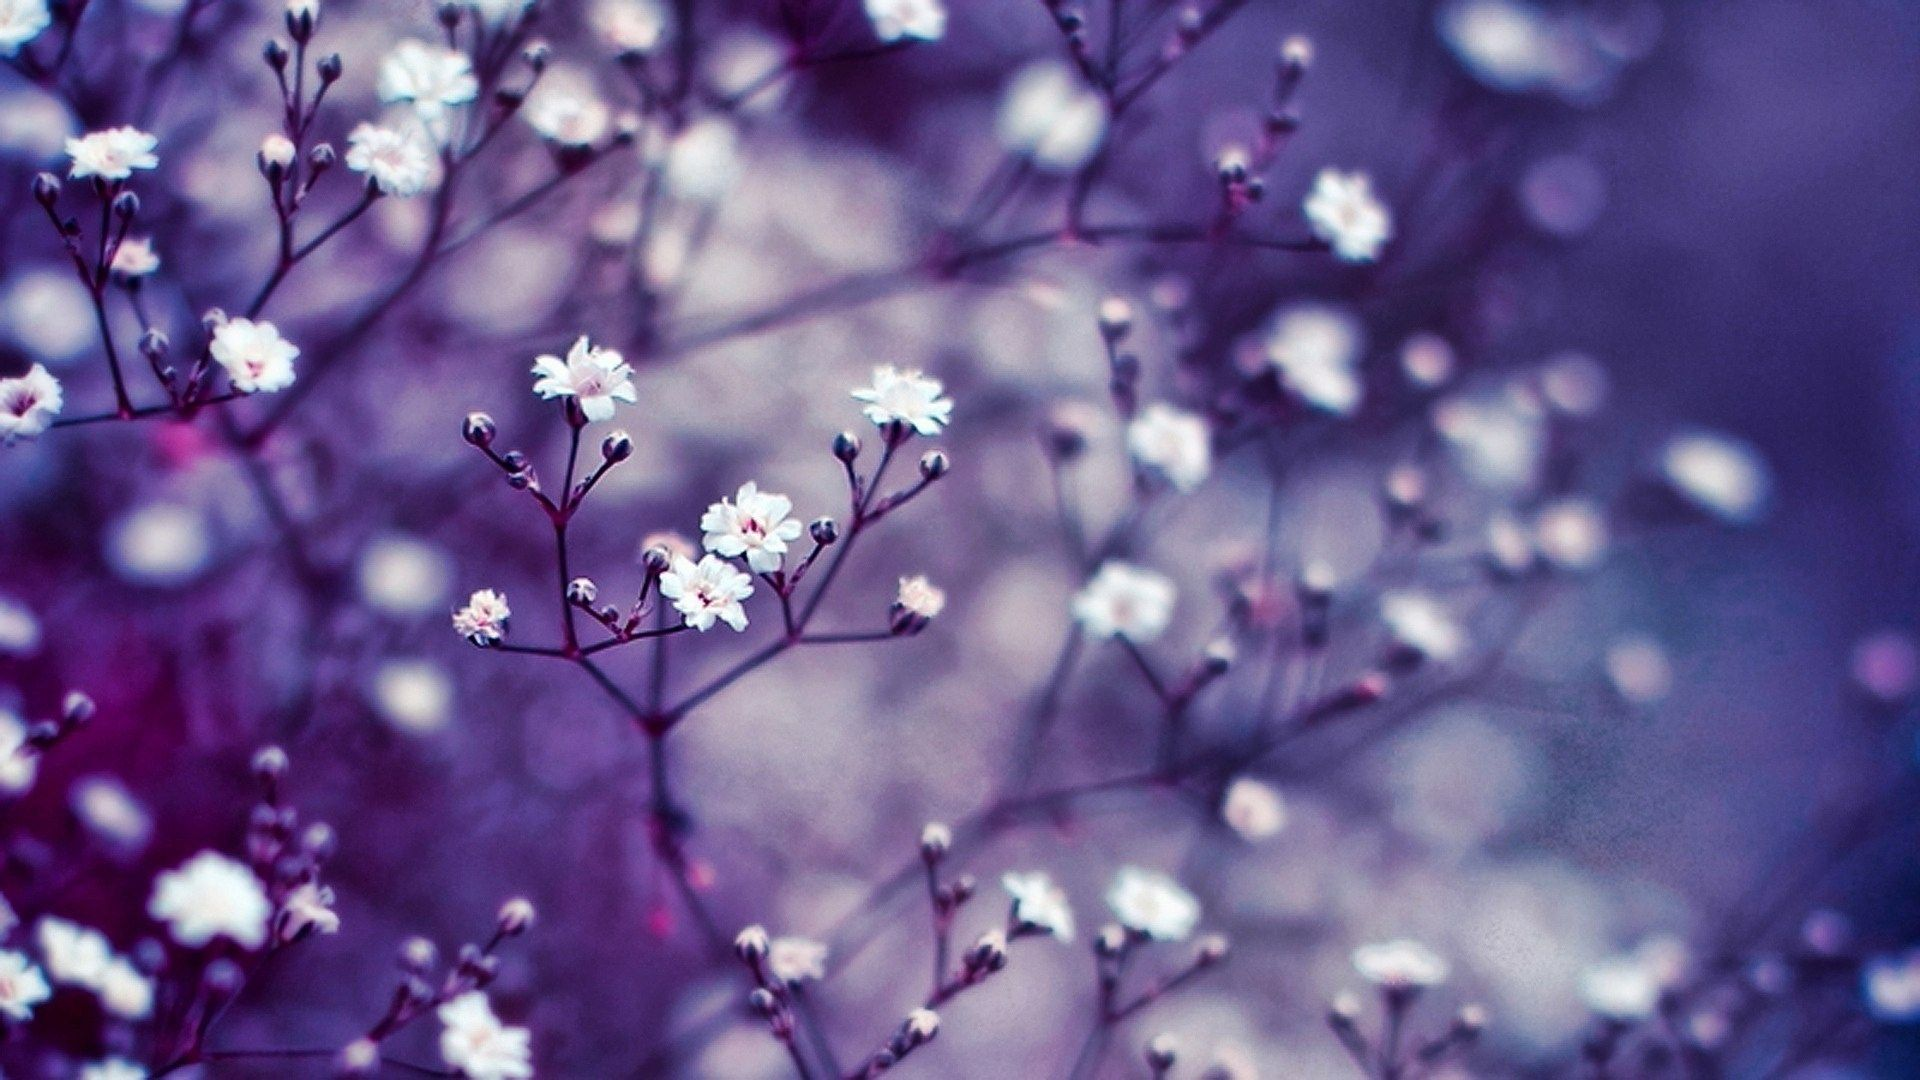 Flower Hd Wallpapers Top Free Flower Hd Backgrounds Wallpaperaccess